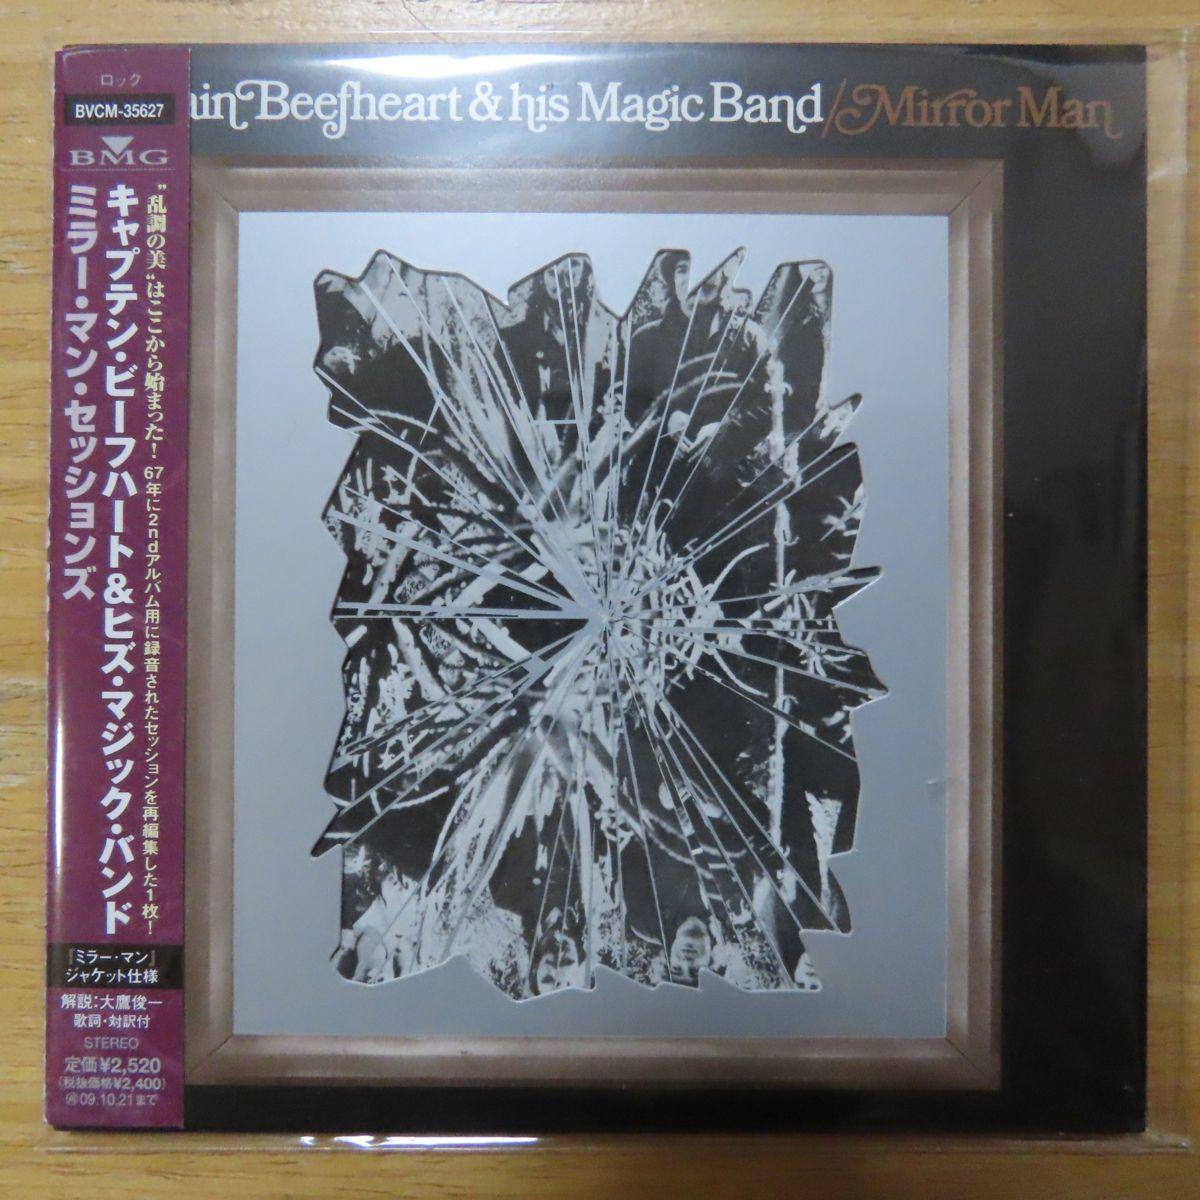 4988017670927;【CD】キャプテン・ビーフハート&ザ・マジック・バンド / ミラー・マン・